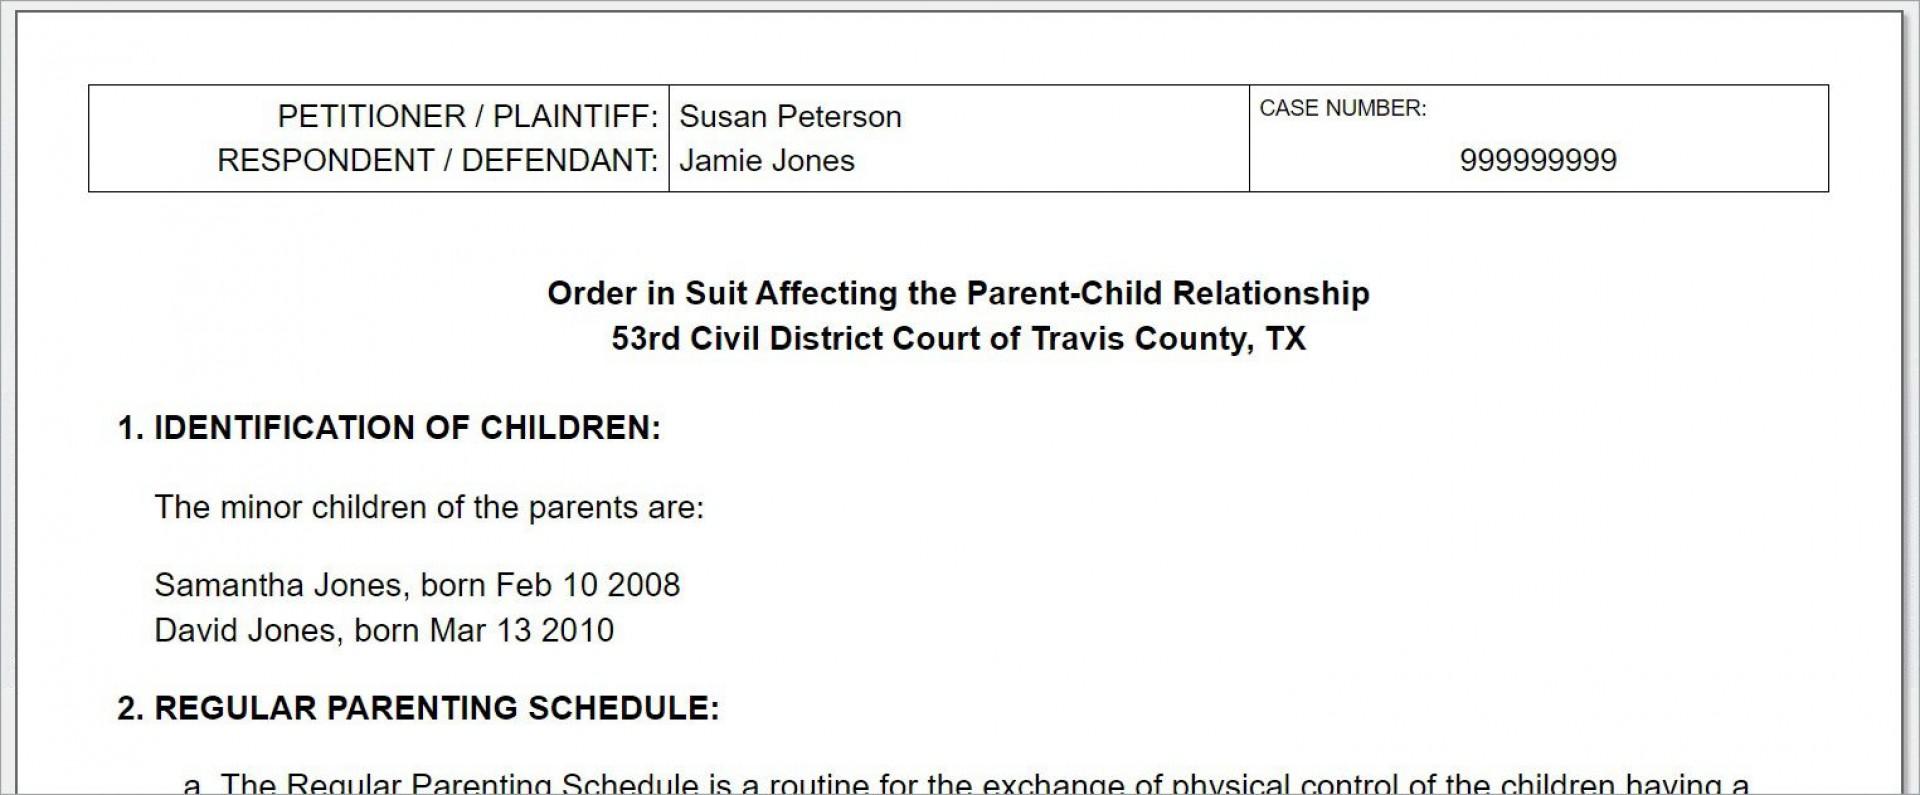 008 Breathtaking Child Custody Agreement Template Highest Quality  Texa Nc Visitation Uk1920